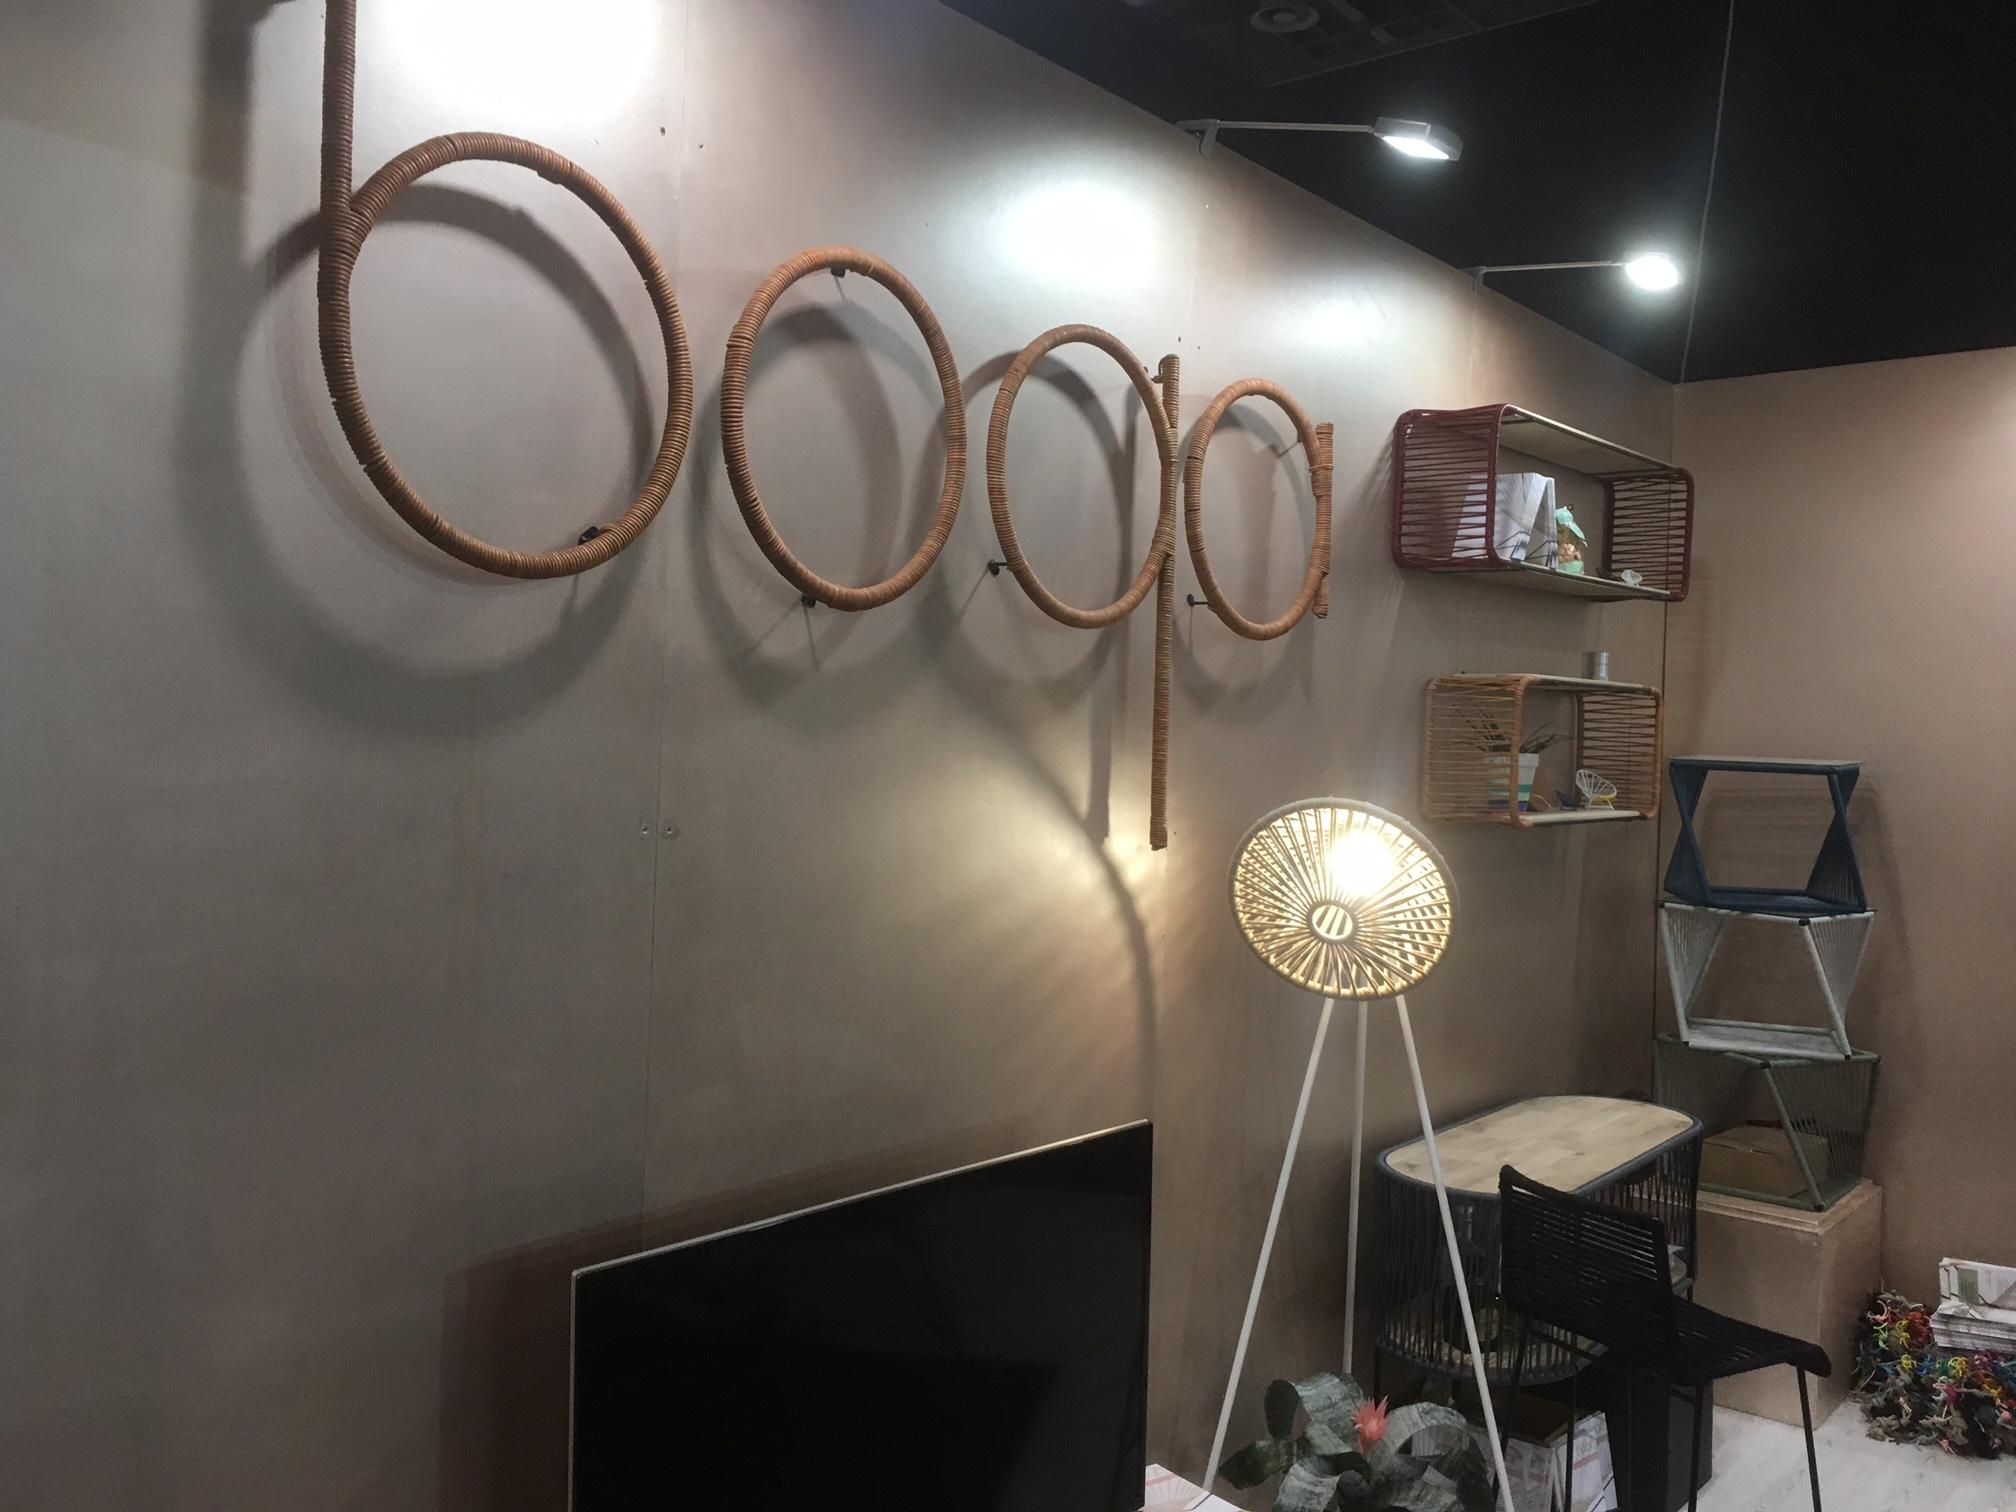 Stand BOQA - Maison & Objet 2018